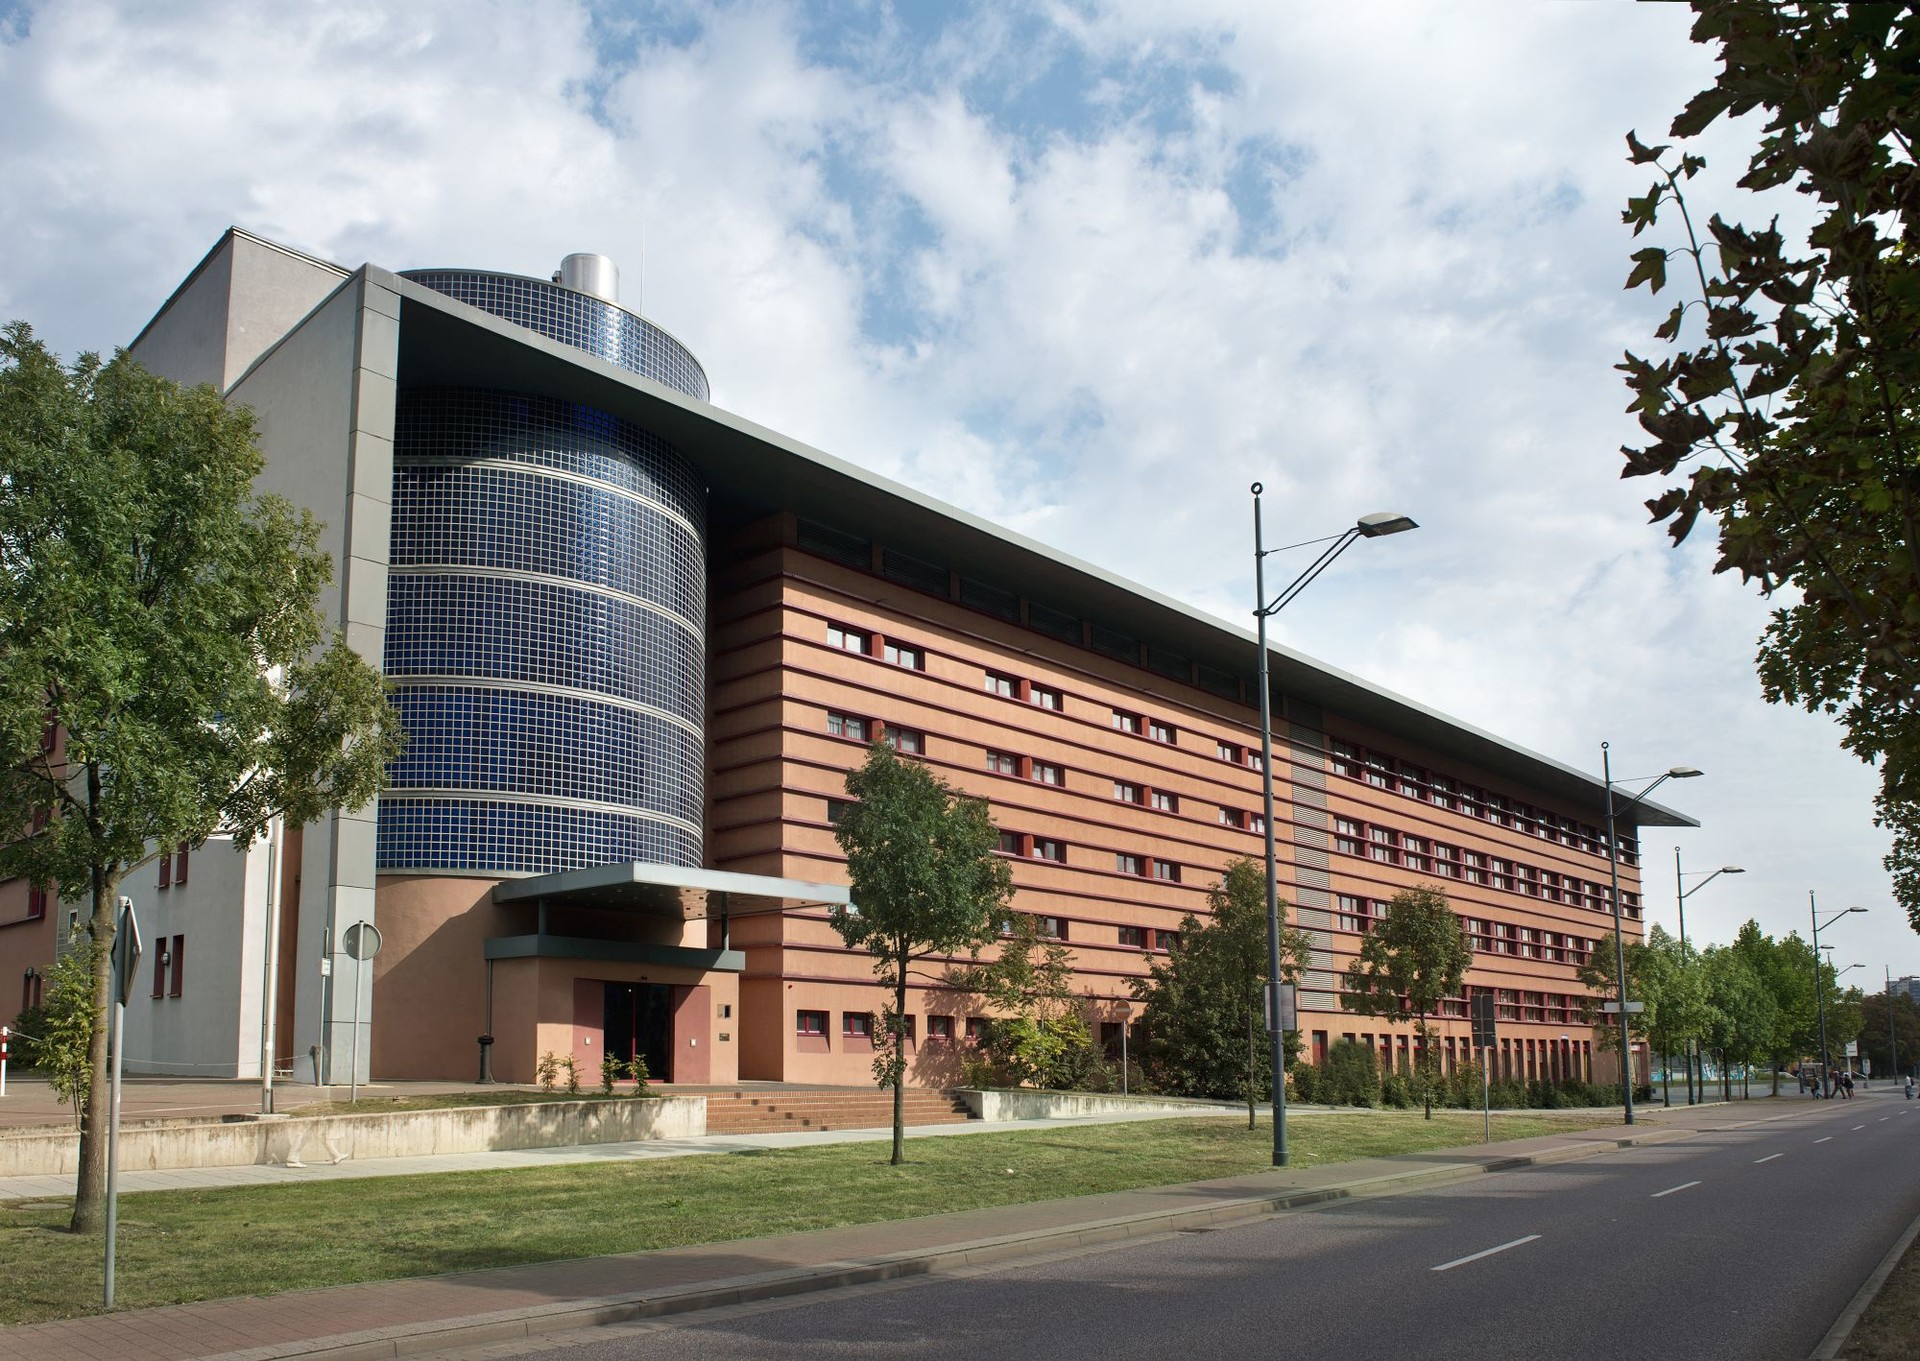 Casino Halle